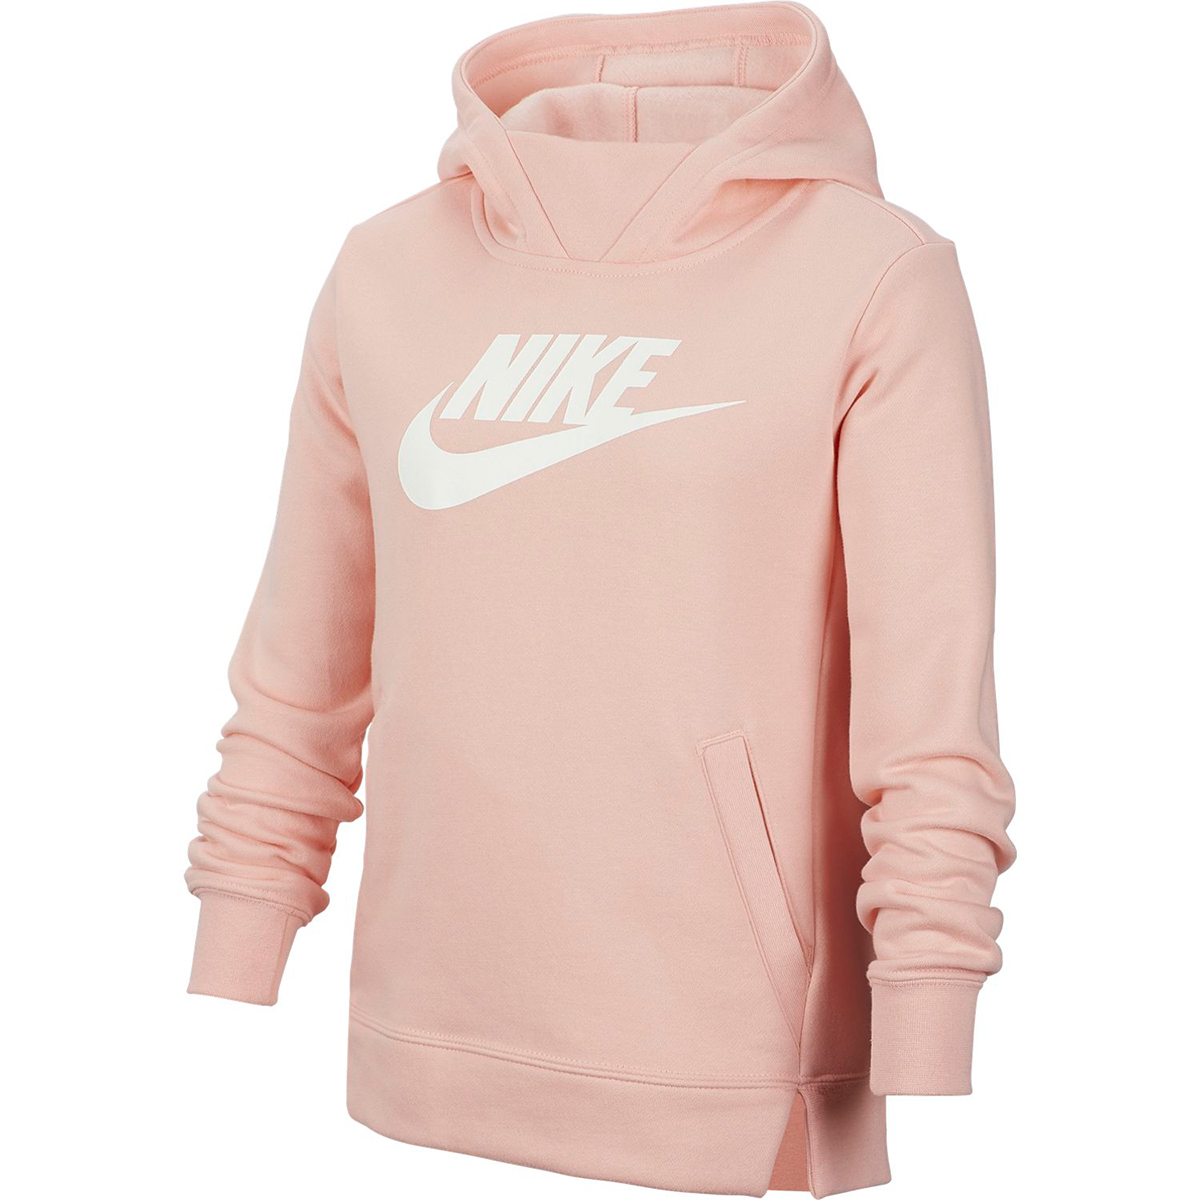 Nike Girls' Sportswear Pullover Hoodie - Red, S